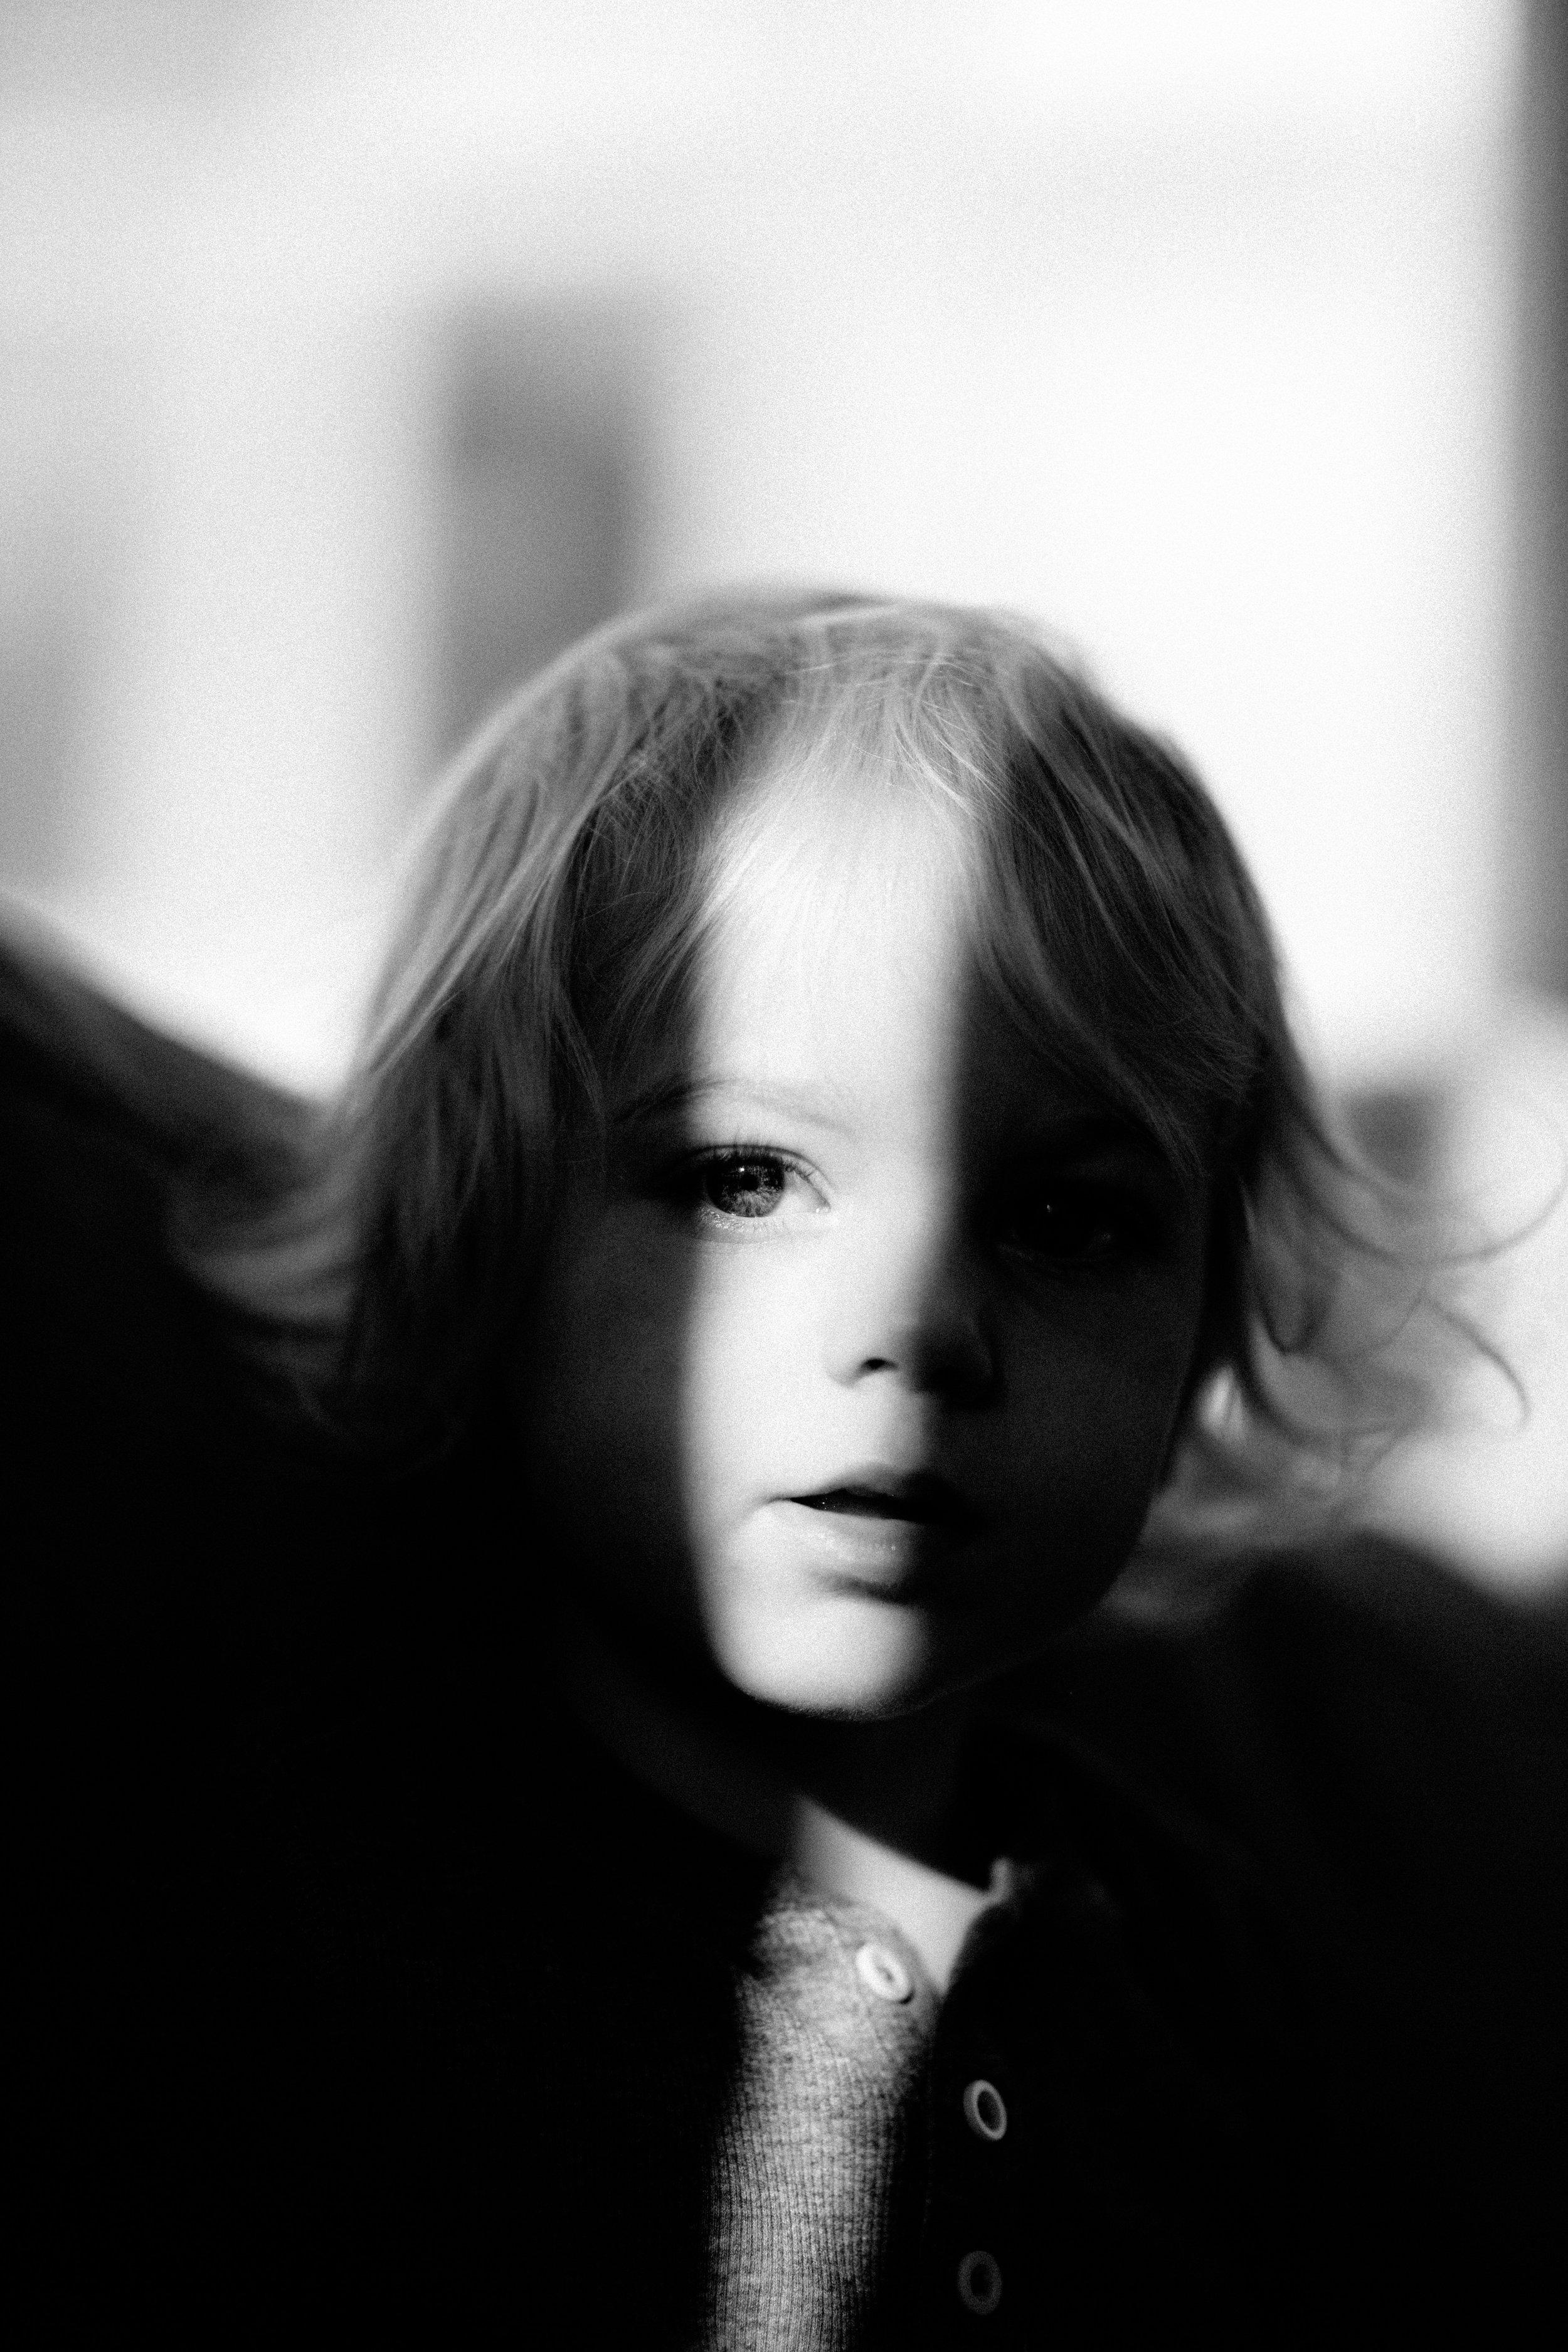 Adopted child trauma & impact www.relavate.org